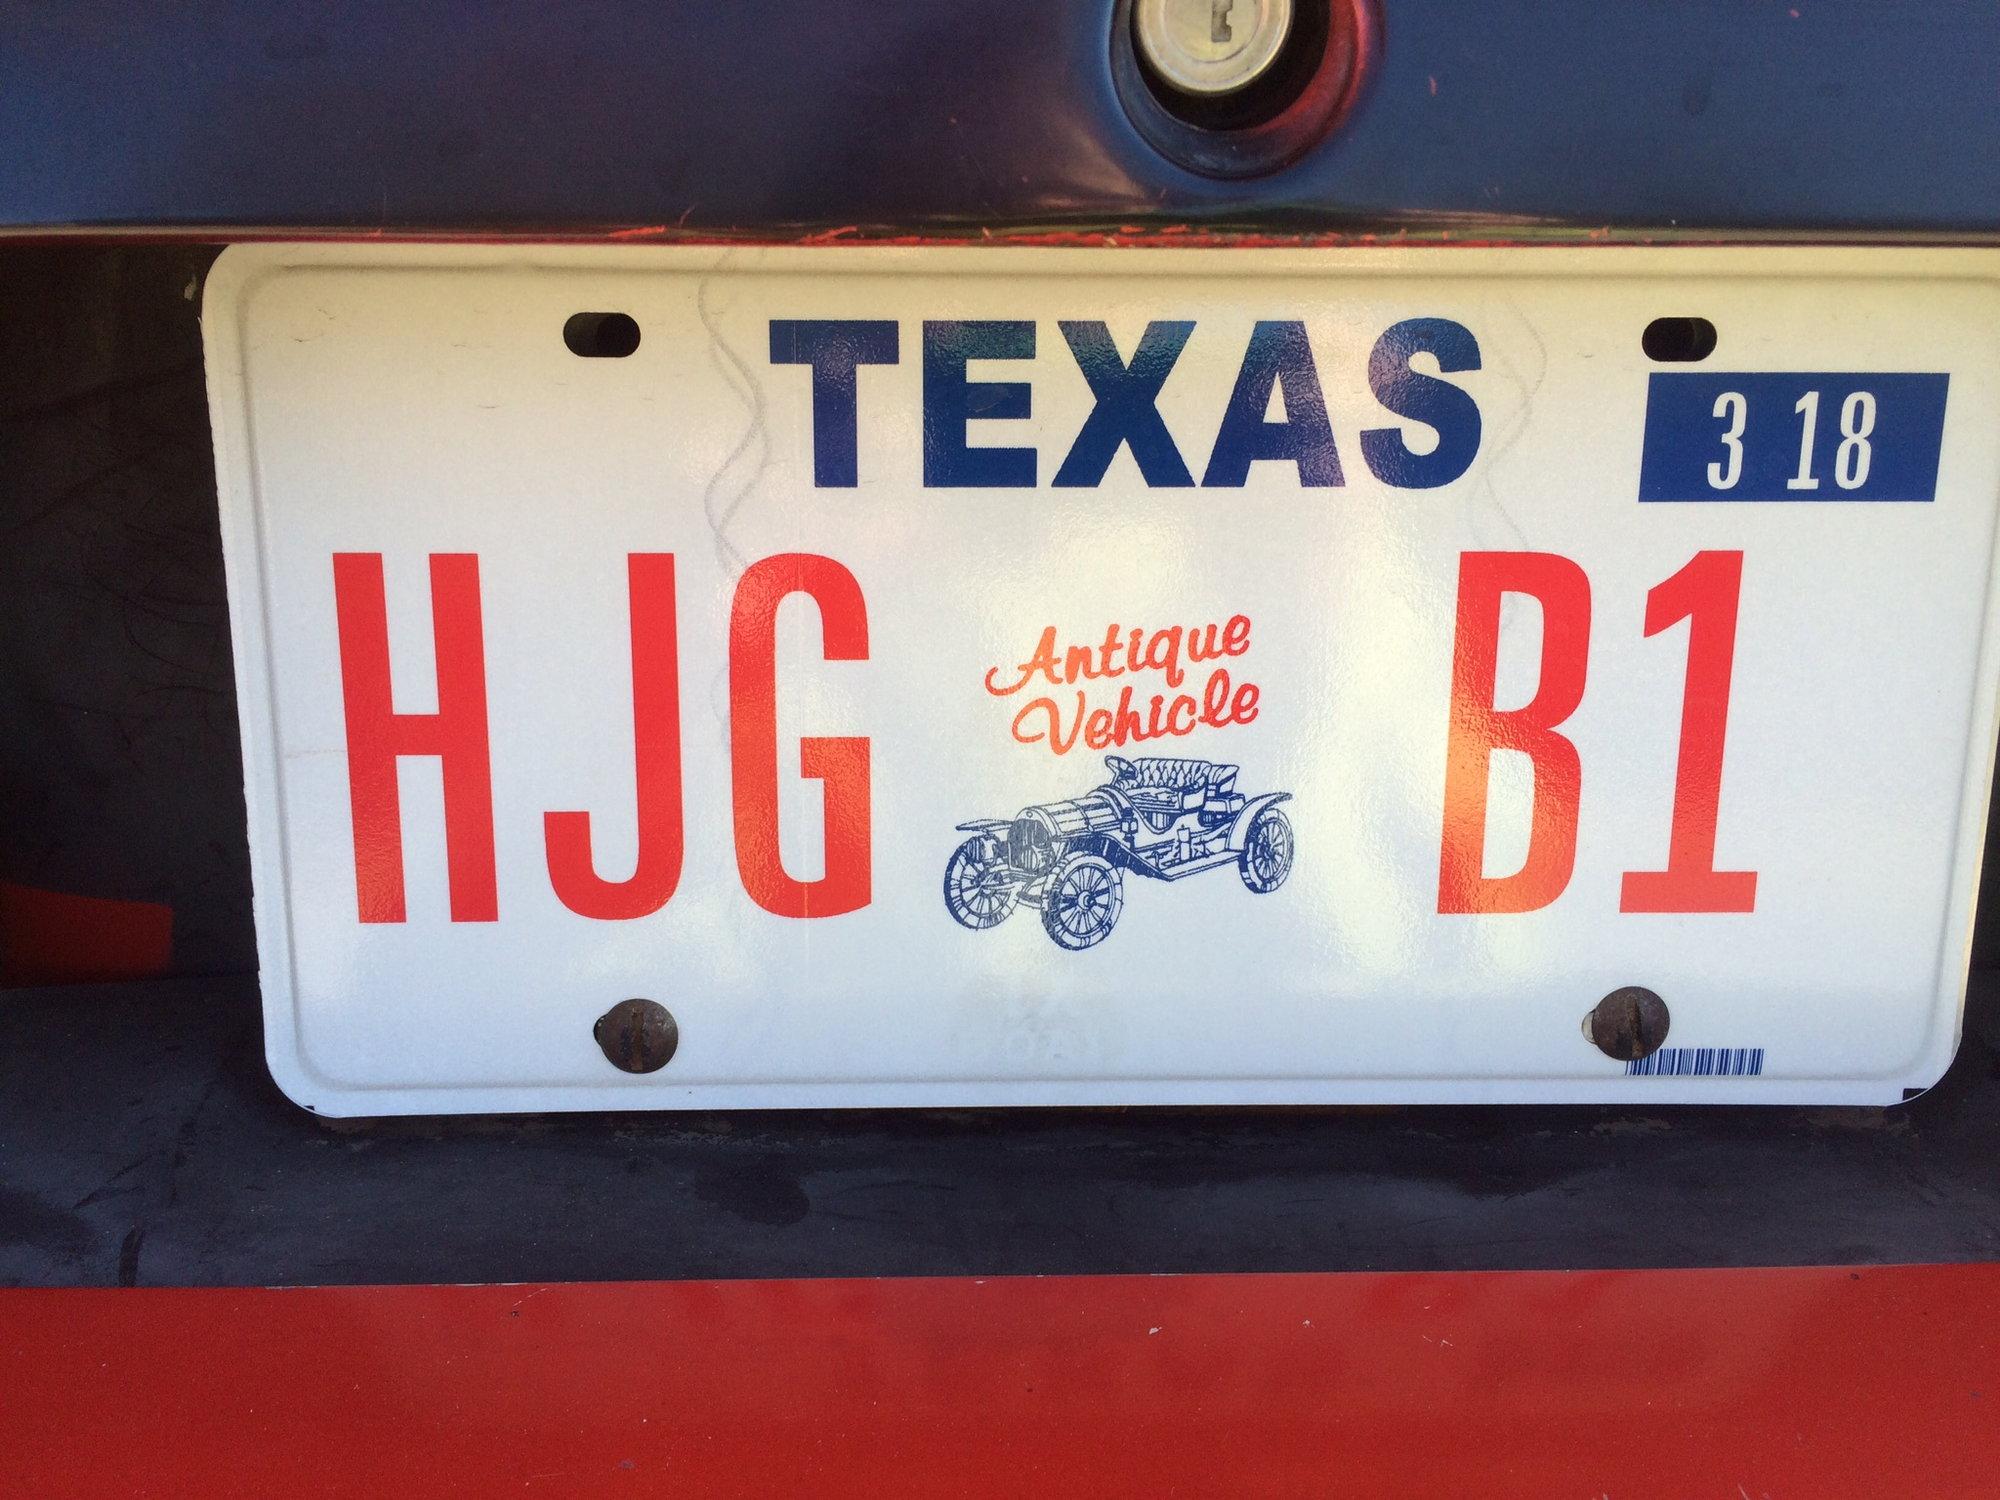 Texas Renewing Antique Vehicle Registration Corvetteforum